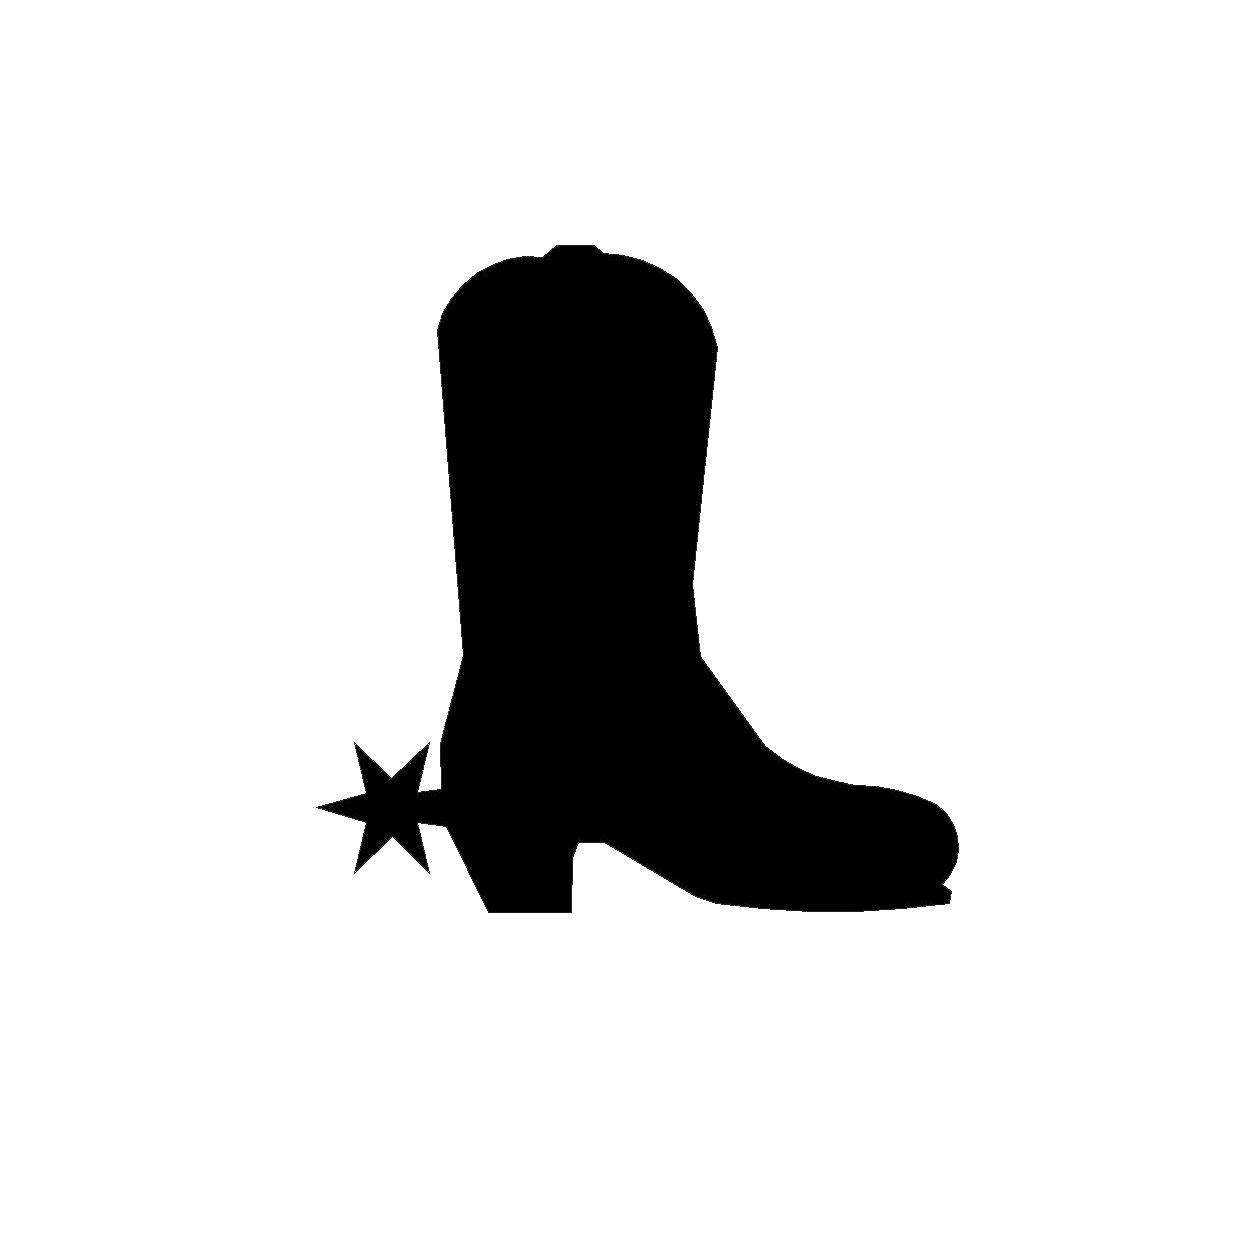 1260x1260 Image Cowboy Boot Silhouette Clip Art Image